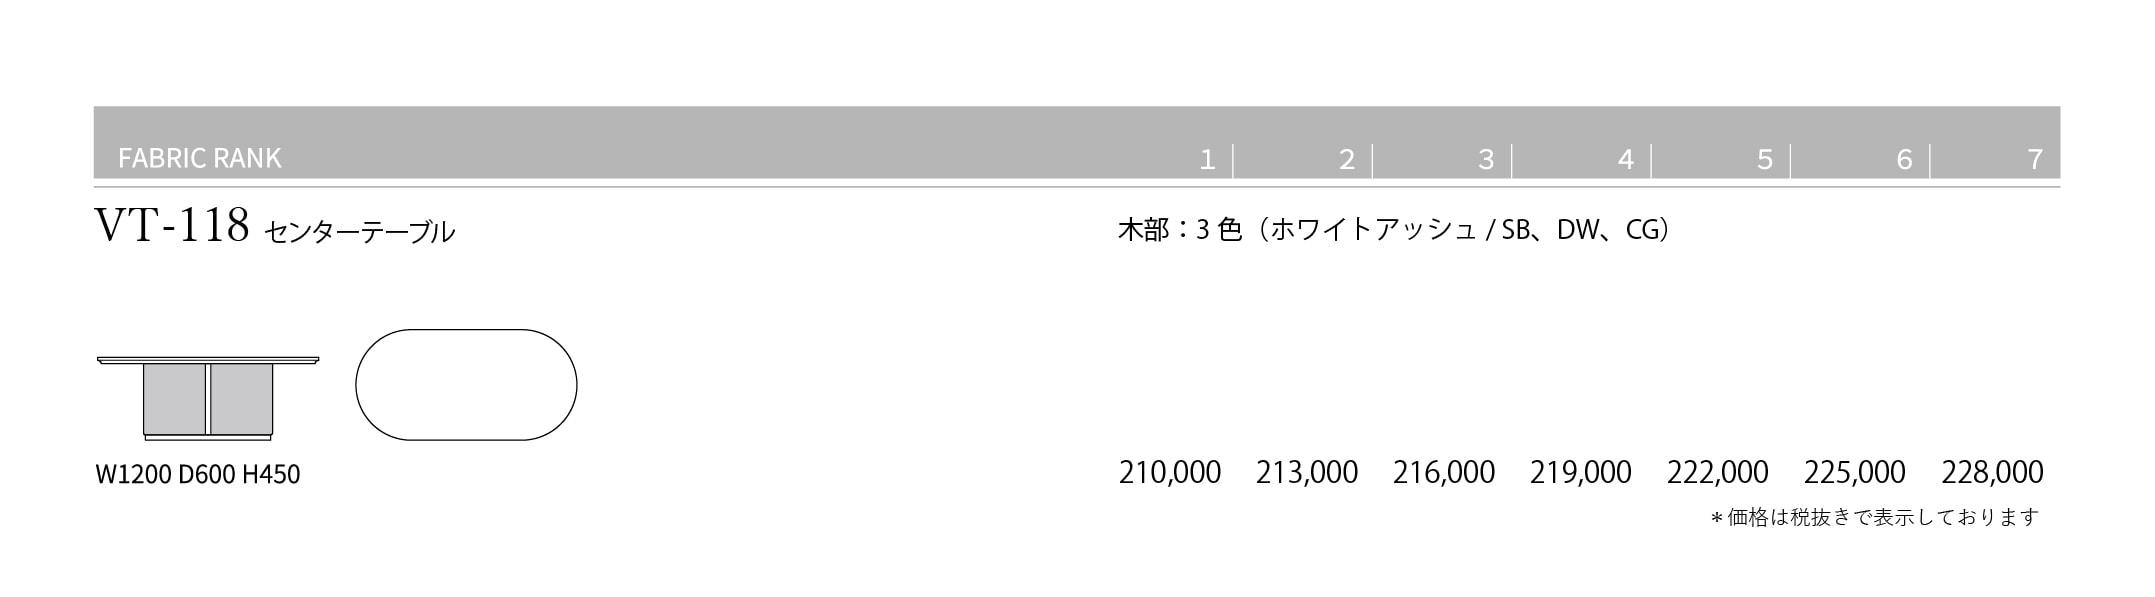 VT-118 Price List